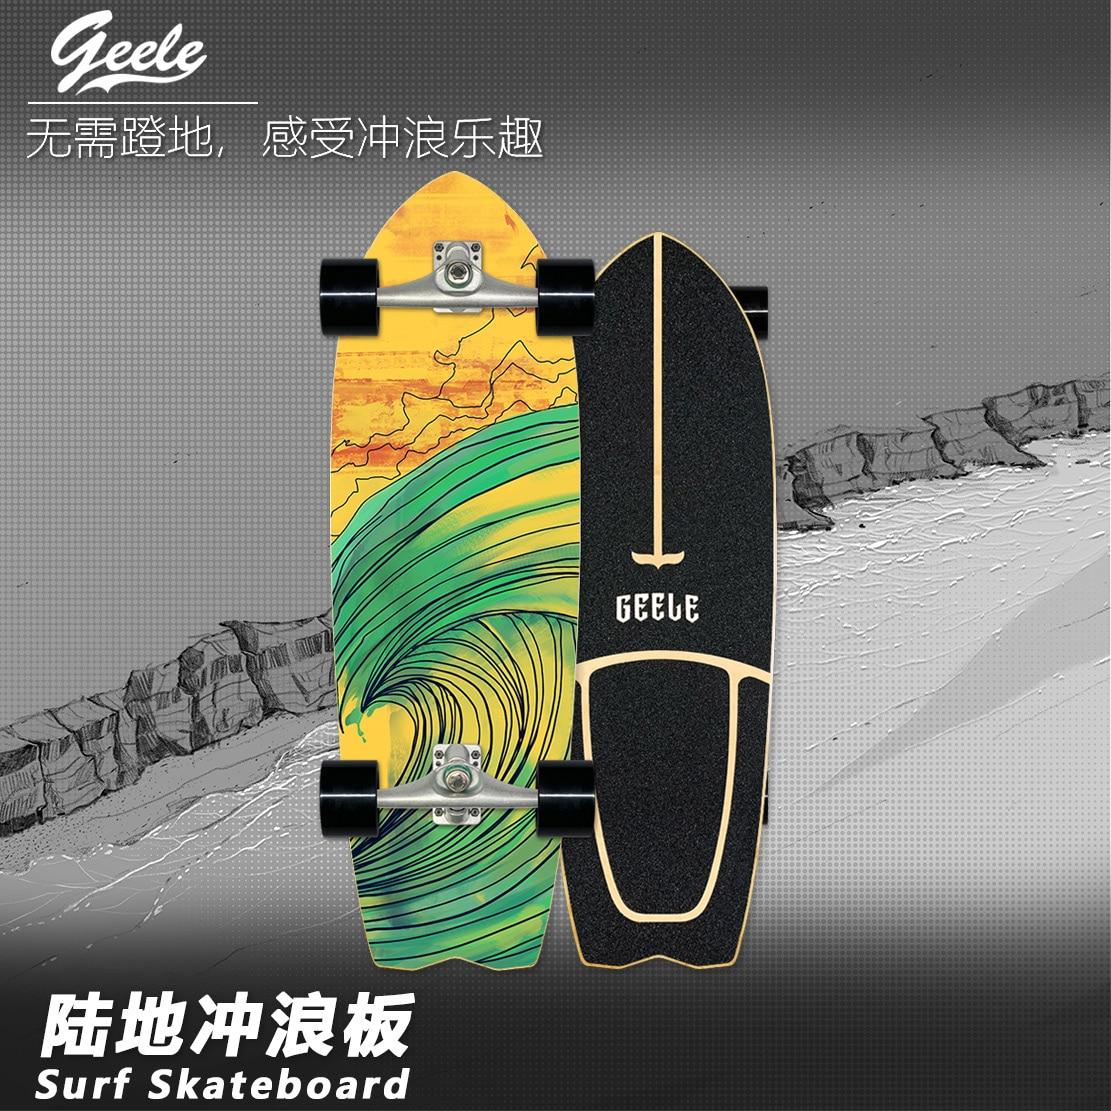 Professional Surfskate Maple Skateboard Teenagers Land Surfboard Skateboard Trucks Thrasher Patineta Sports Equipment BI50SB